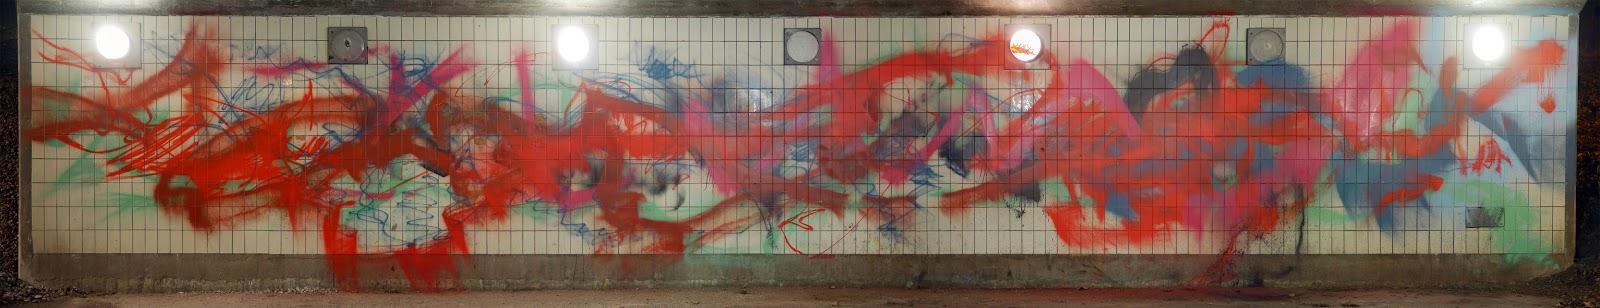 SprayDaily_Graffiti_Ikaros_2